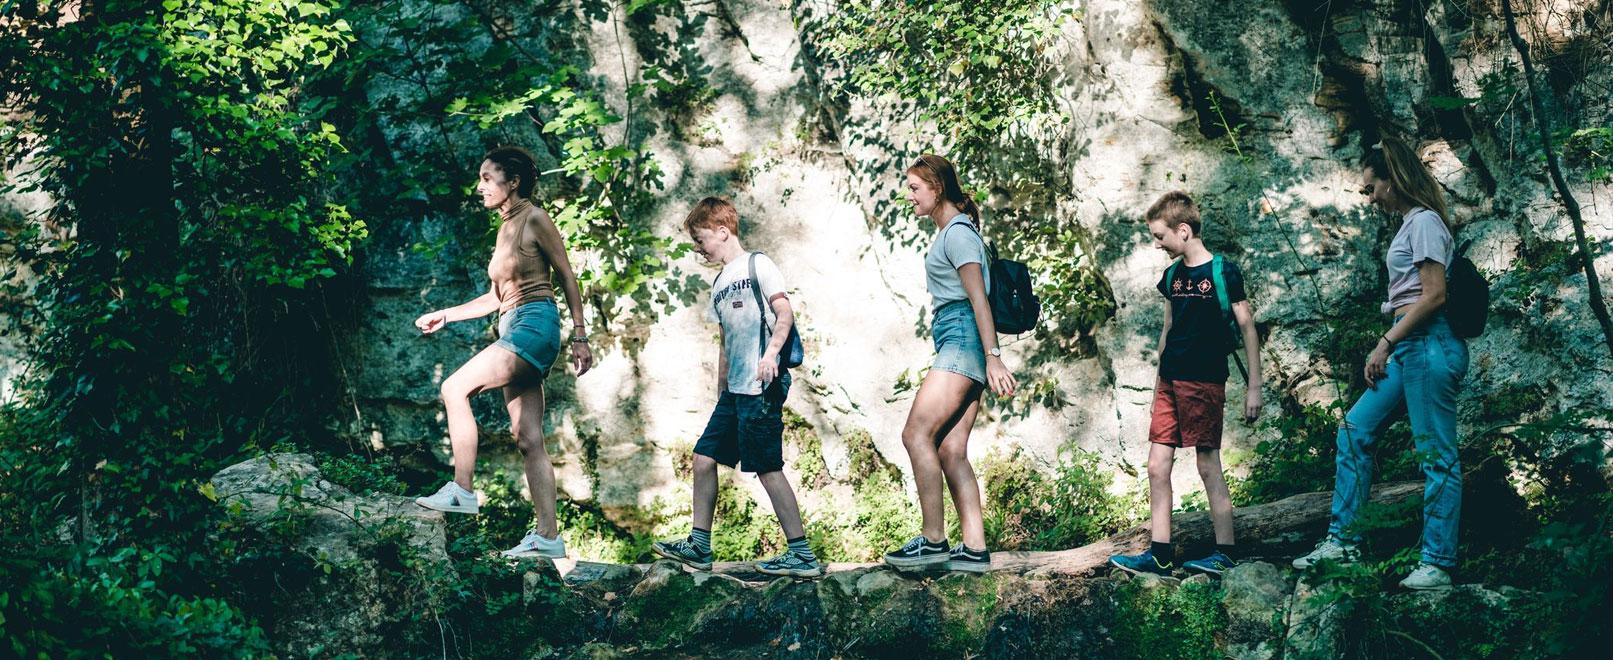 Senderismo Vaucluse Provence © O'Brien